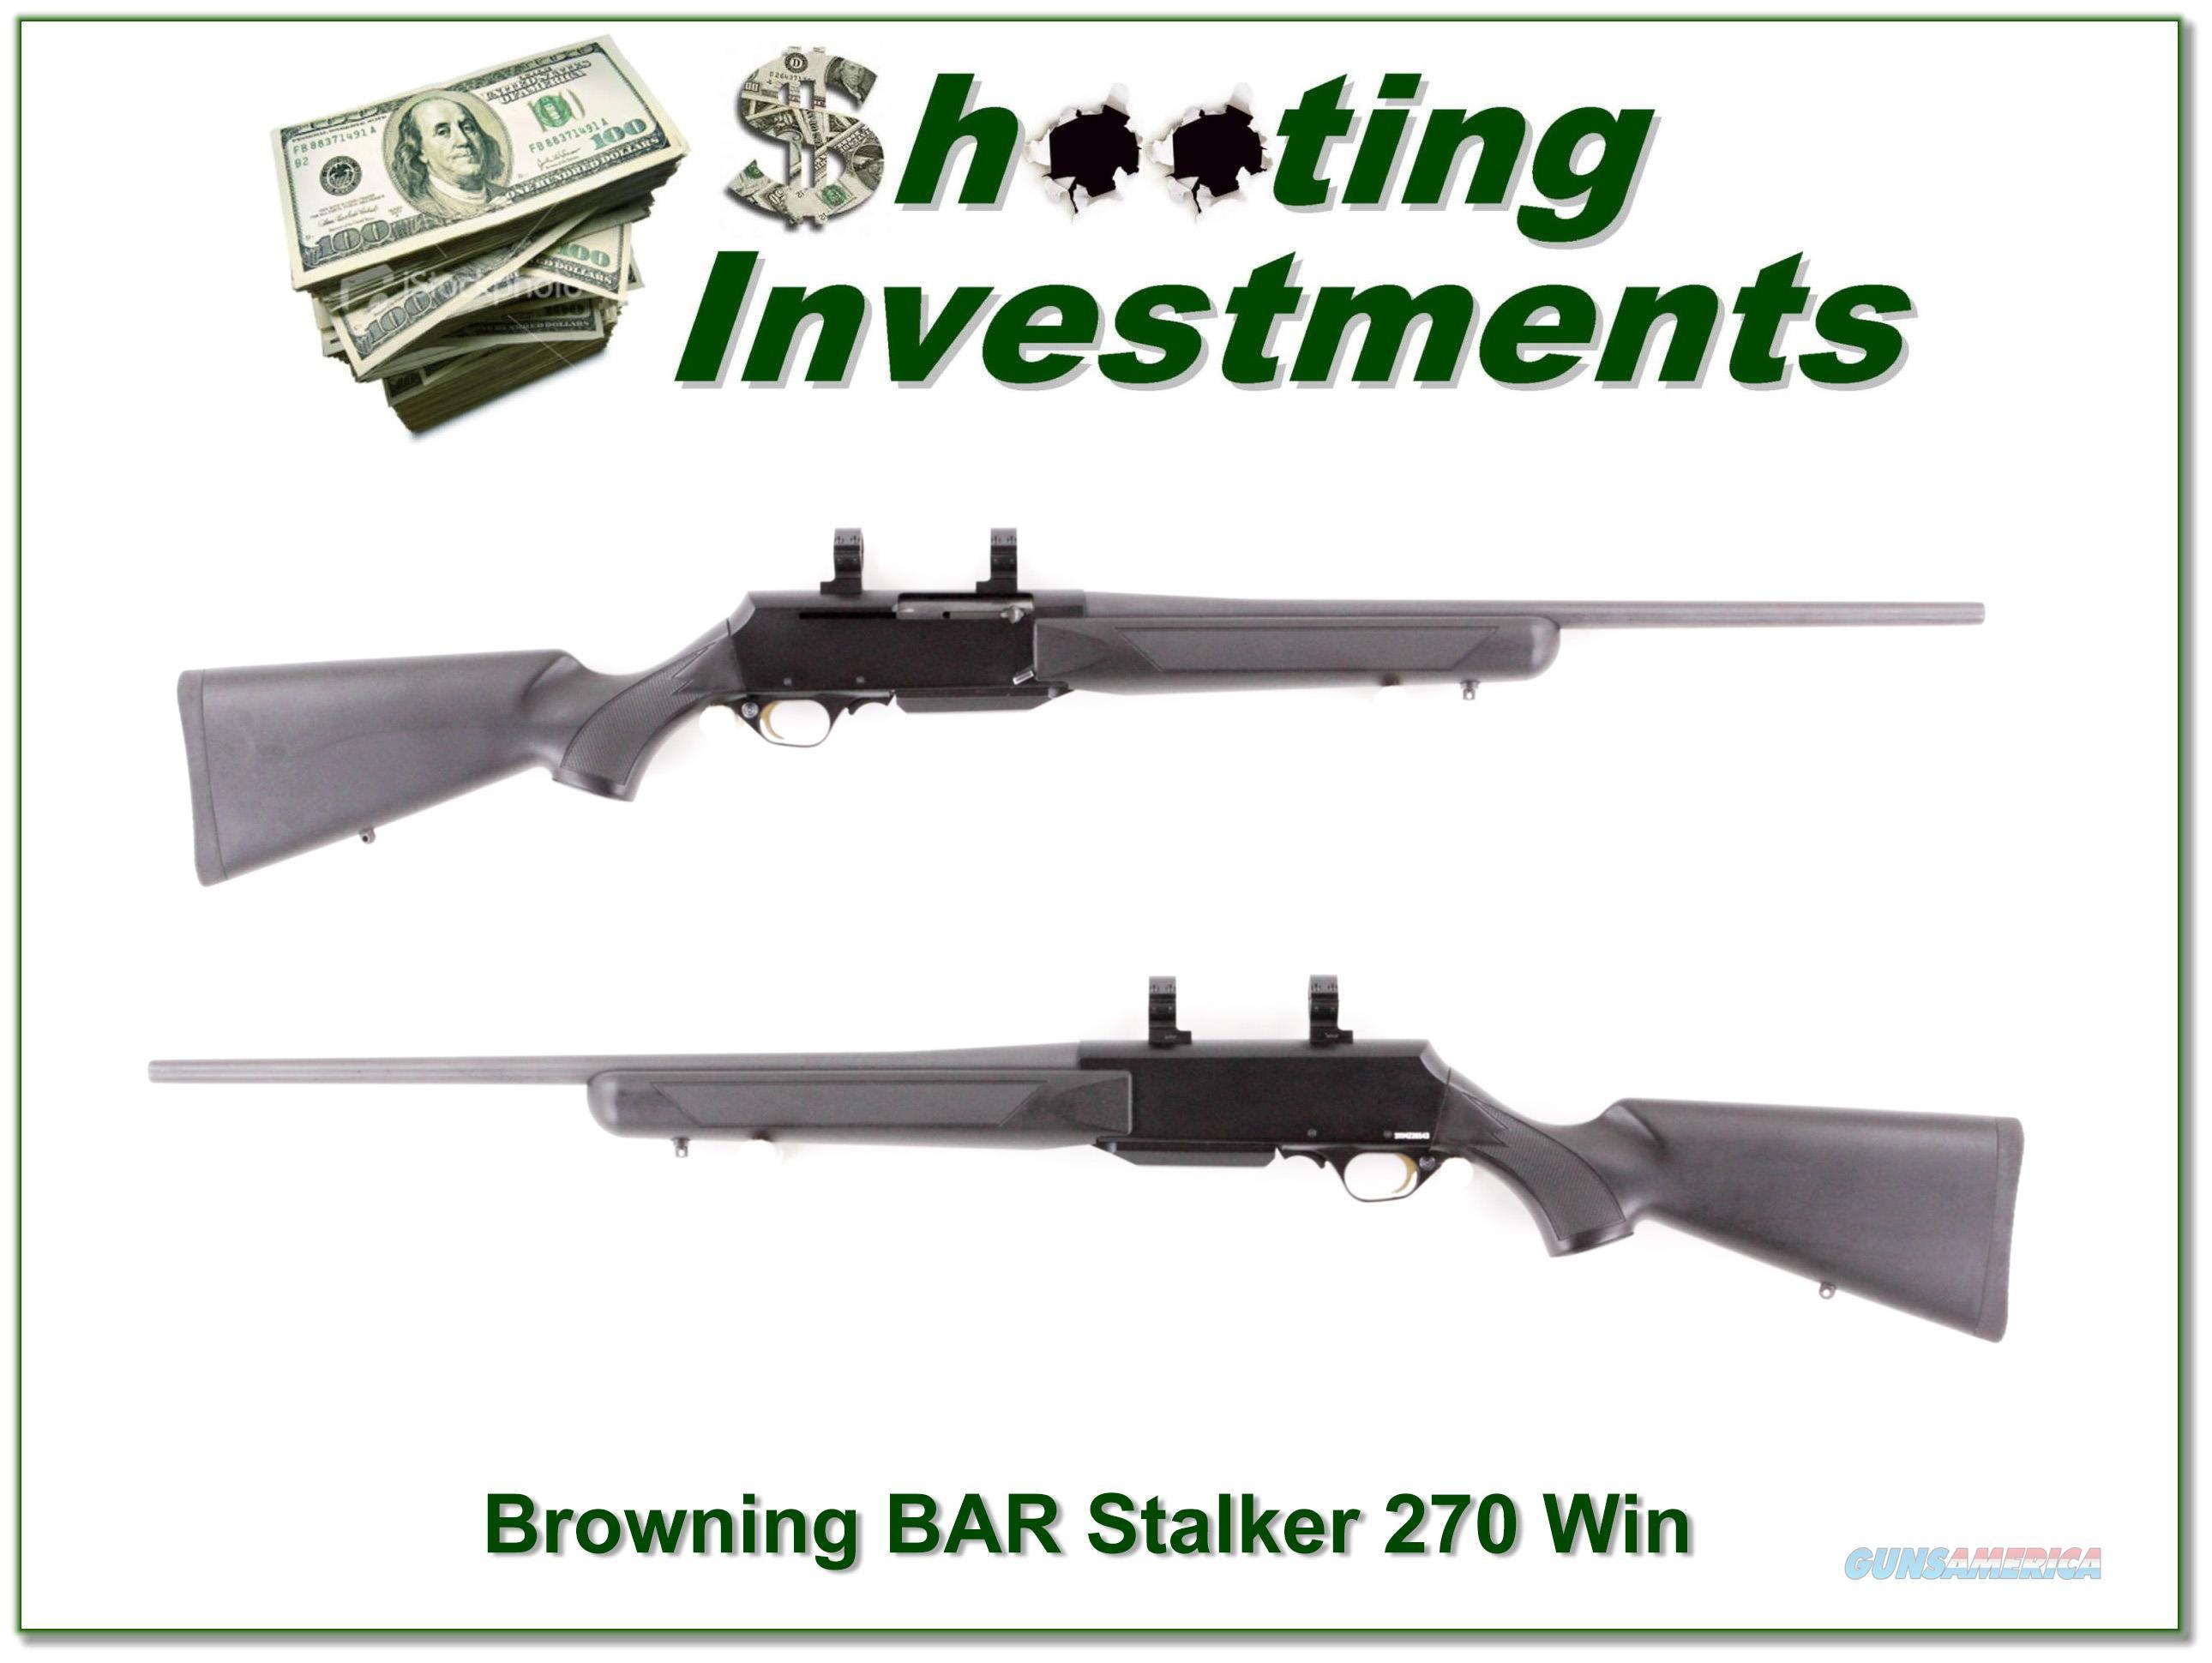 Browning BAR Mark II Stalker 270 Win  Guns > Rifles > Browning Rifles > Semi Auto > Hunting